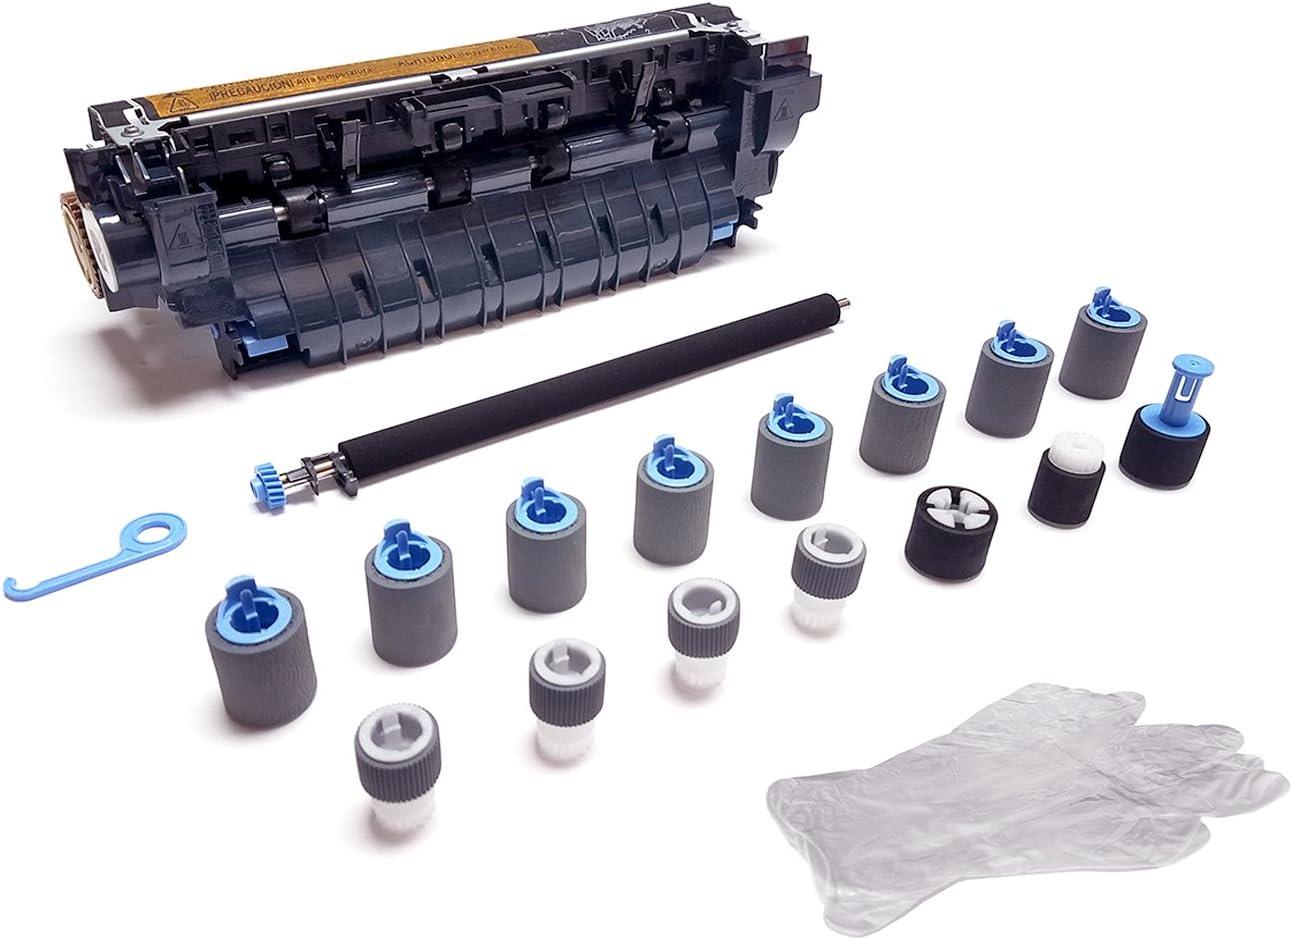 Altru Print CE731A-MK-DLX-AP (CE731-67901, CE502-67909) Deluxe Maintenance Kit for HP Laserjet Enterprise M4555 (110V) Includes RM1-7395 (CE502-67909) Fuser, Transfer Roller & Tray 1-5 Rollers